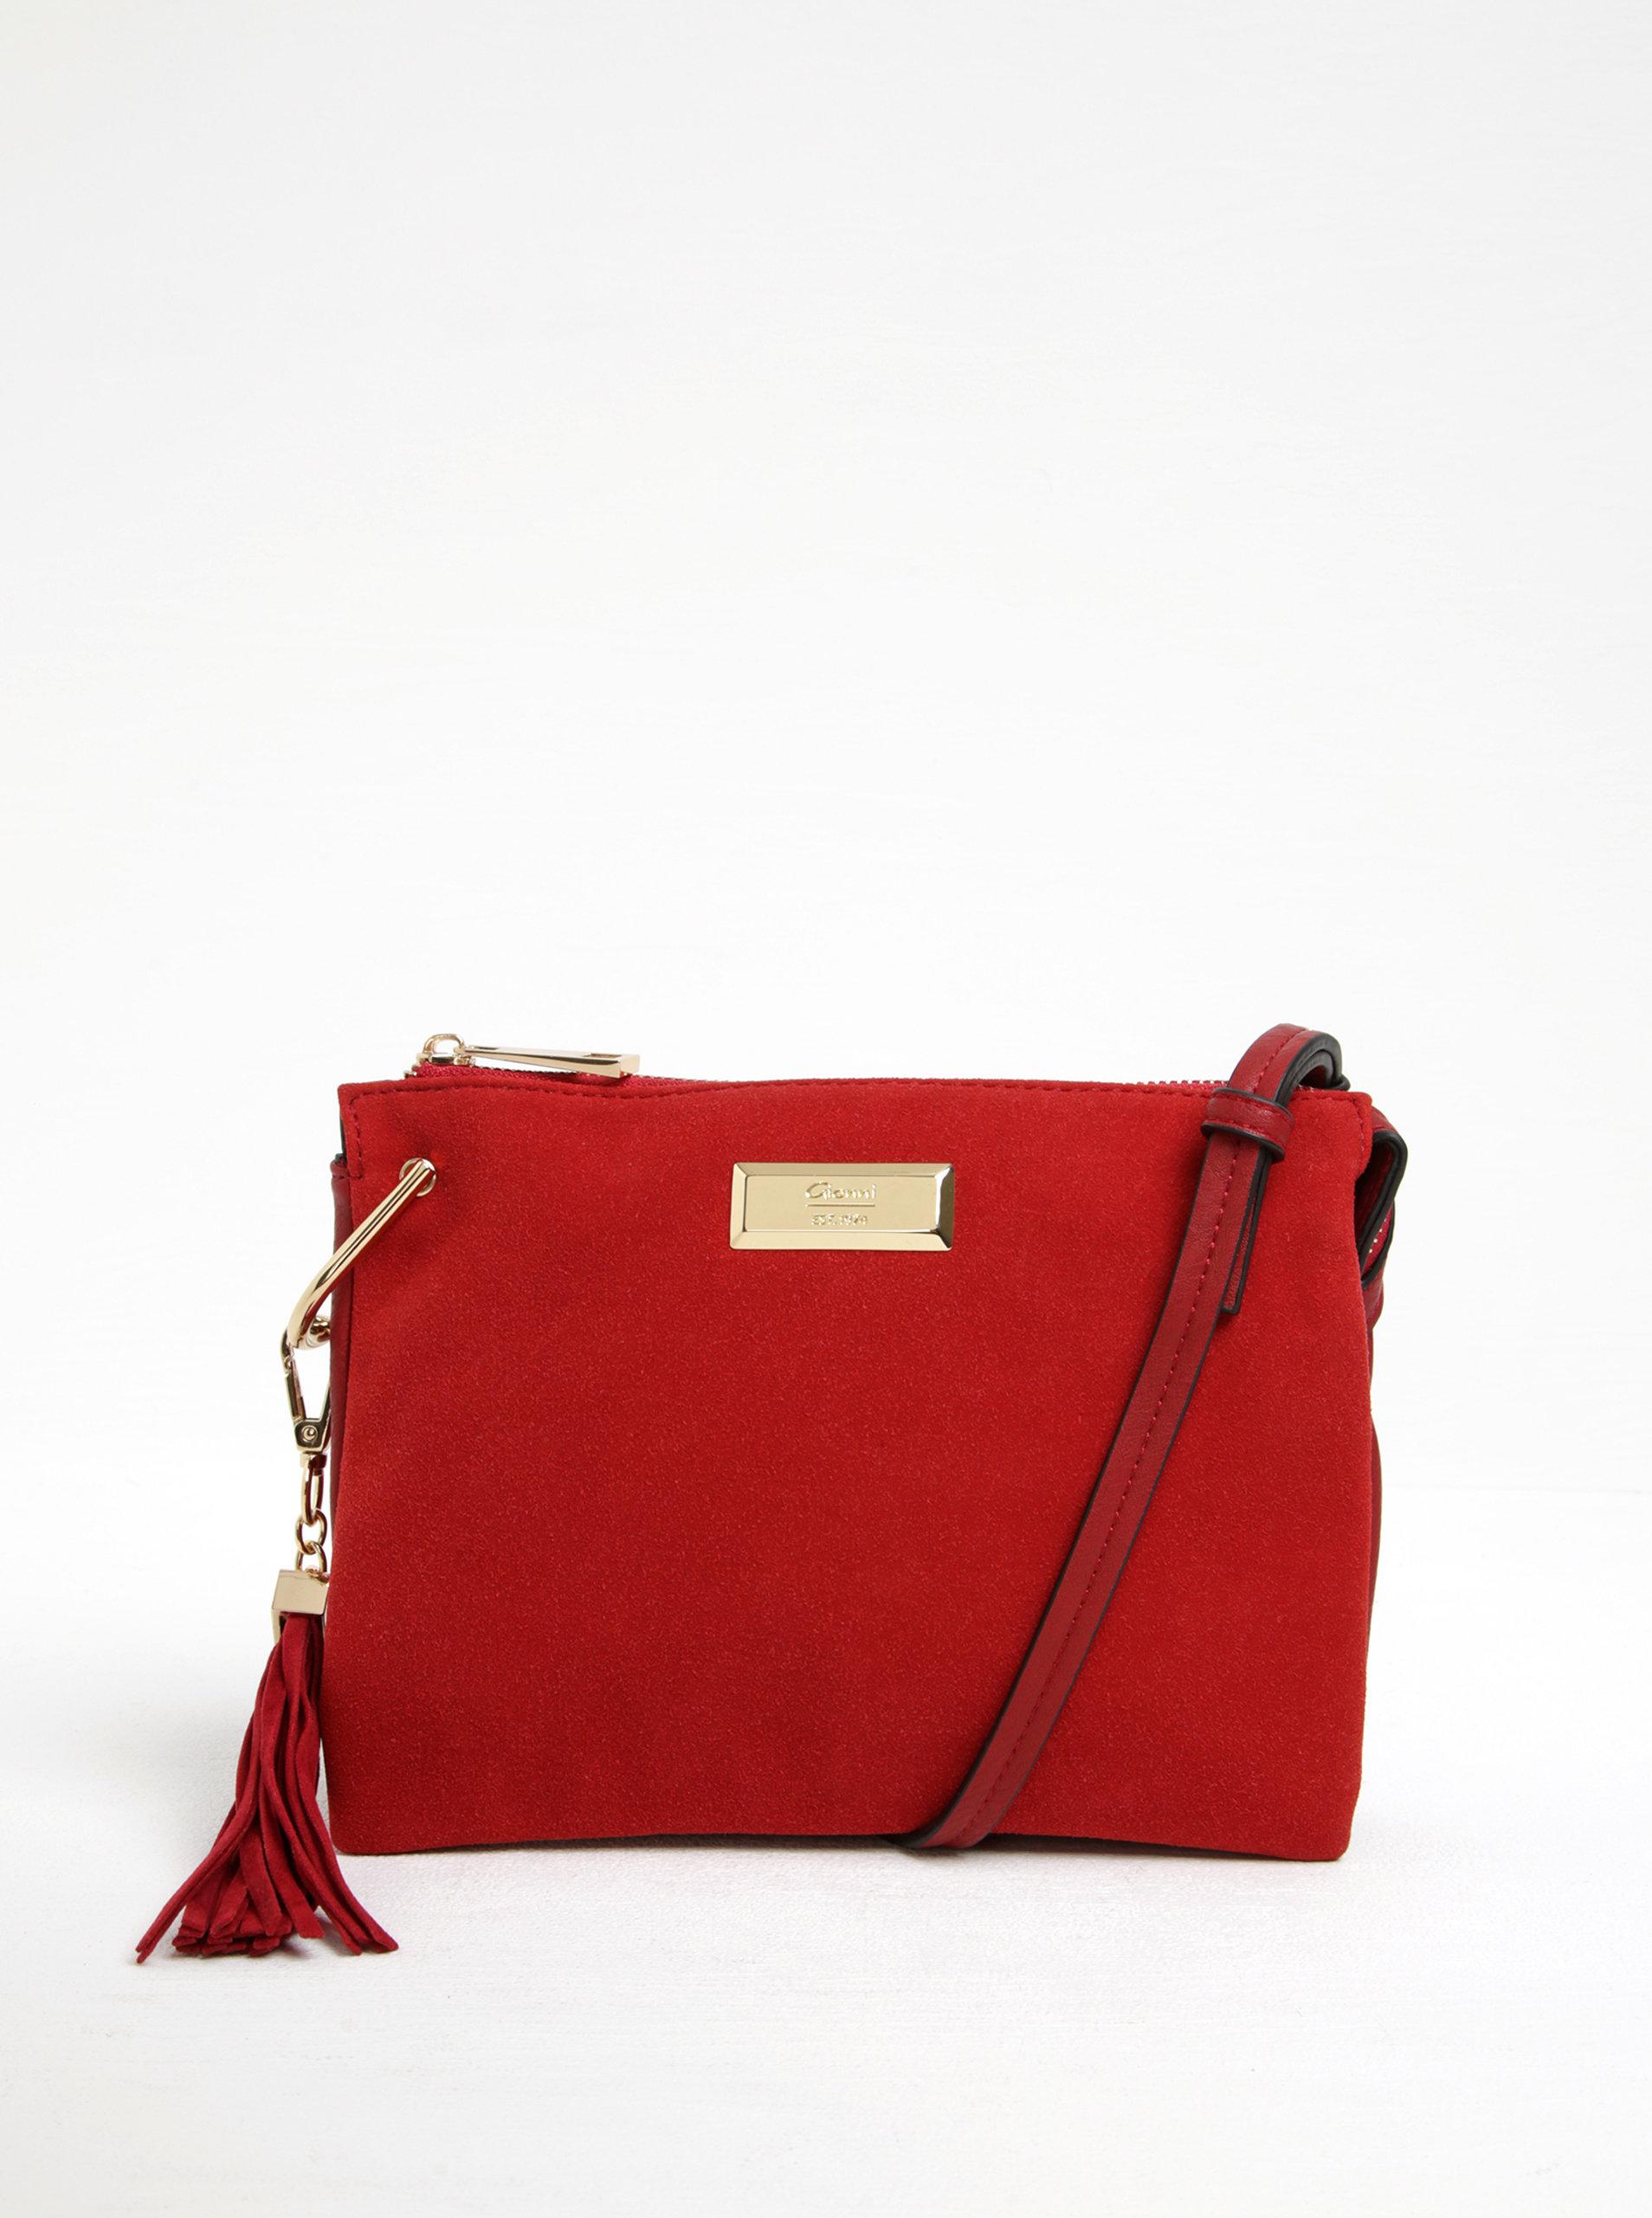 Červená crossbody kabelka v semišovej úprave Gionni Viollette ... 35a8309be68